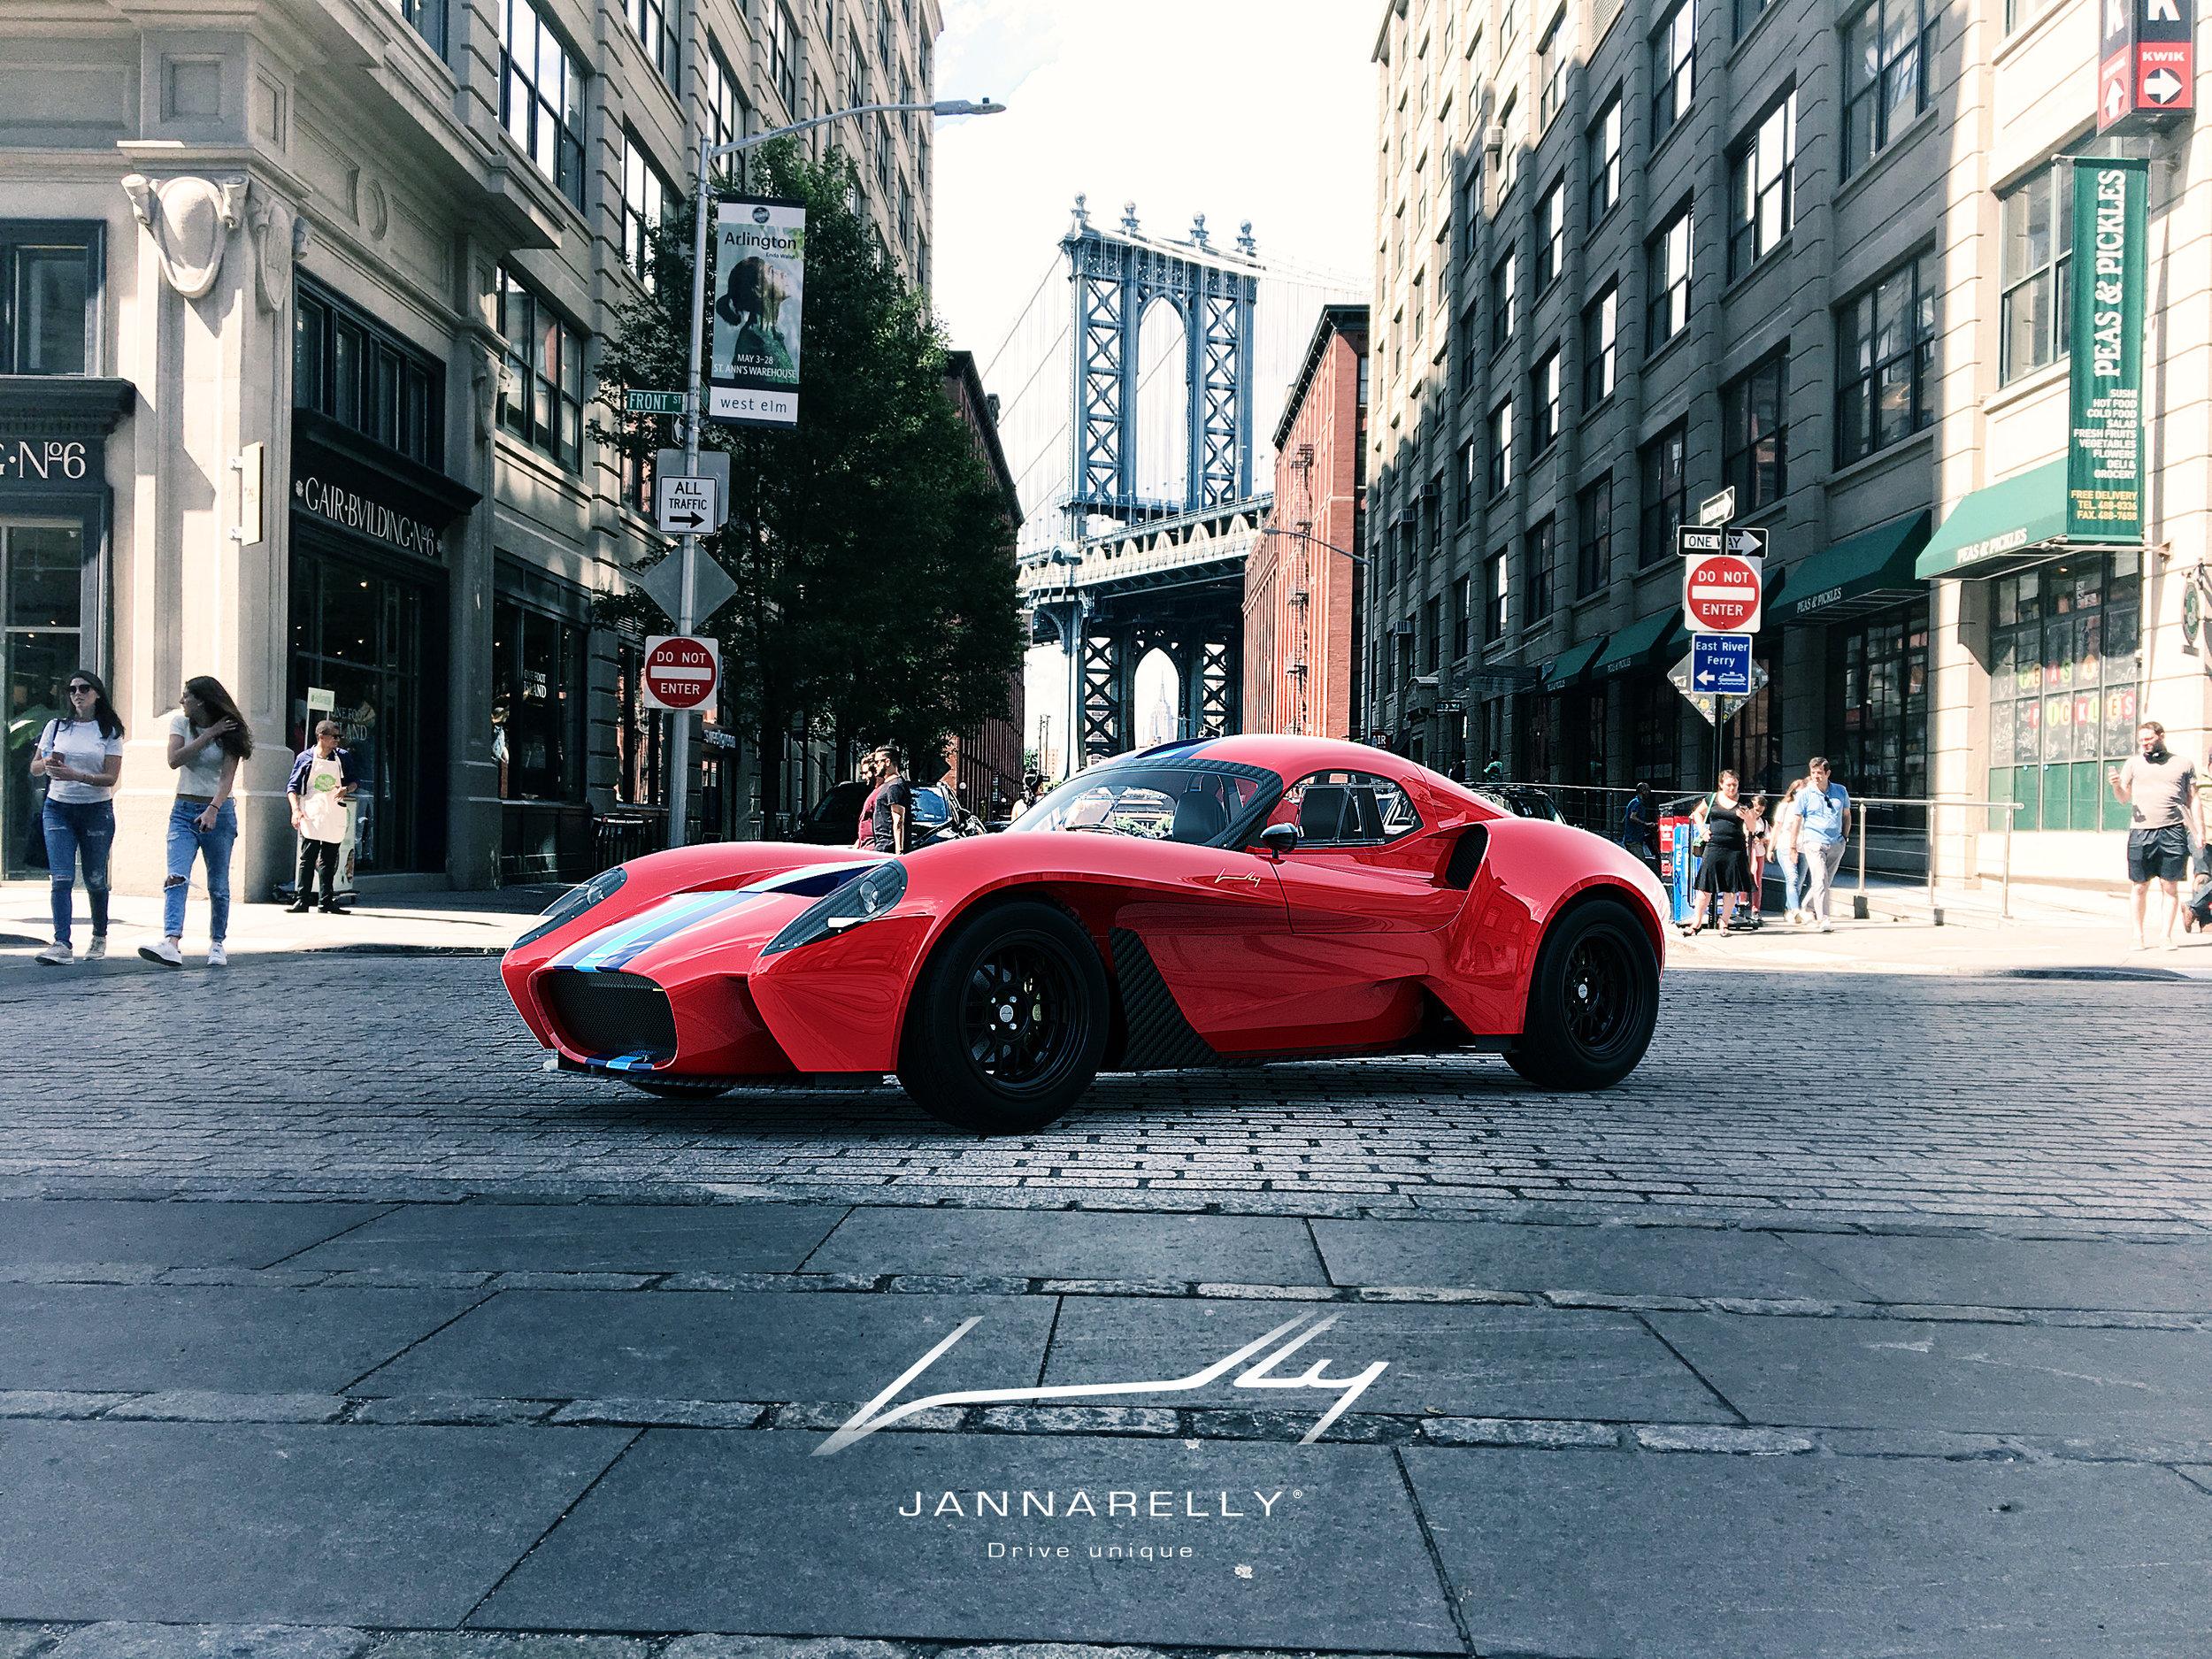 Jannarelly-France-Design-175.jpg